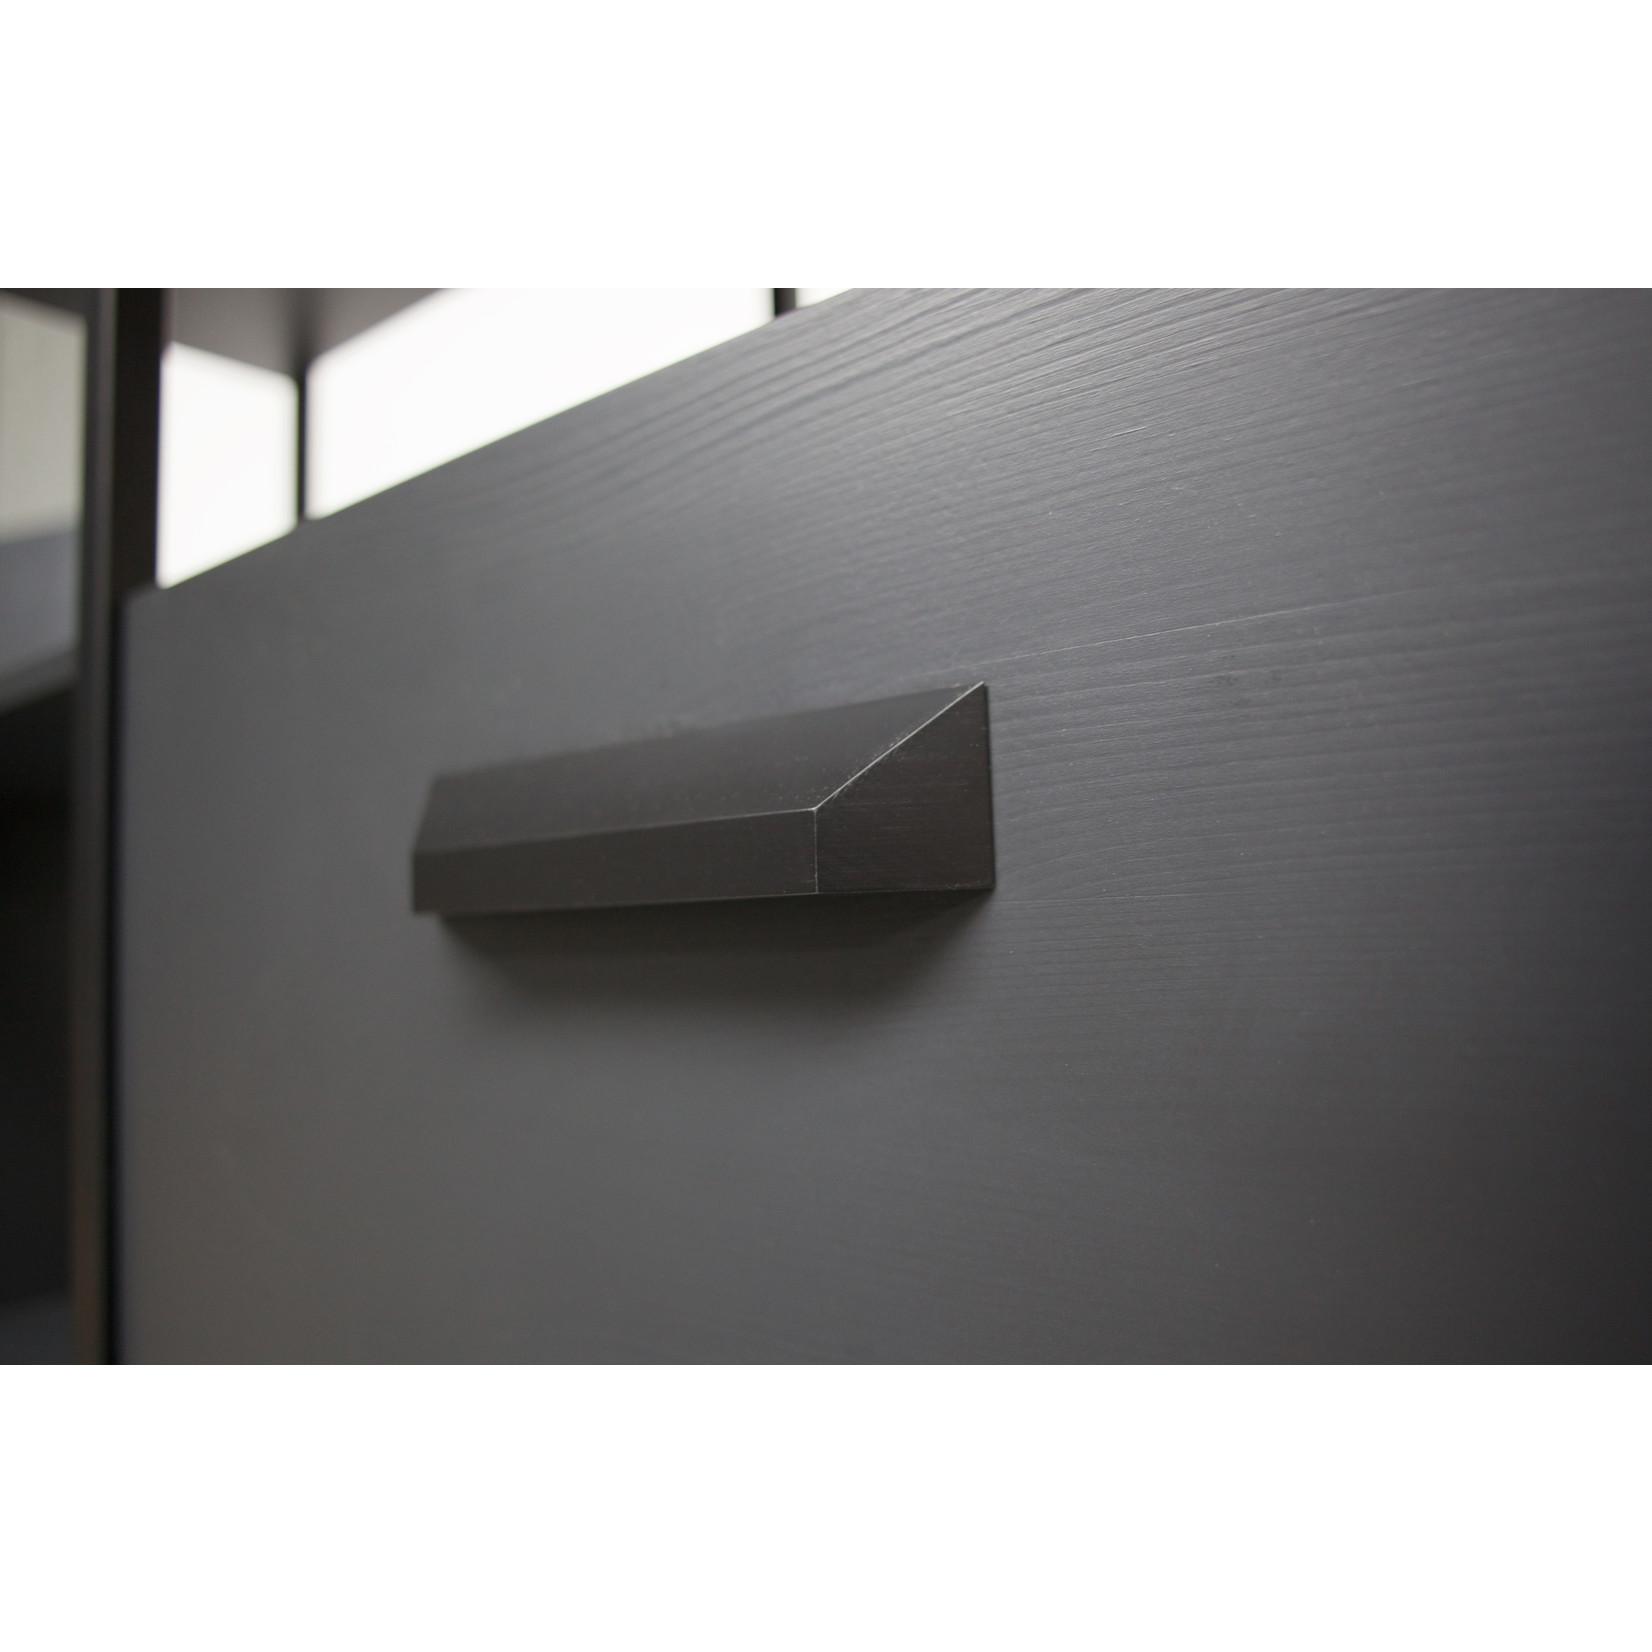 Be Pure Home Legacy Vakkenkast Hout/metaal Matzwart [fsc]